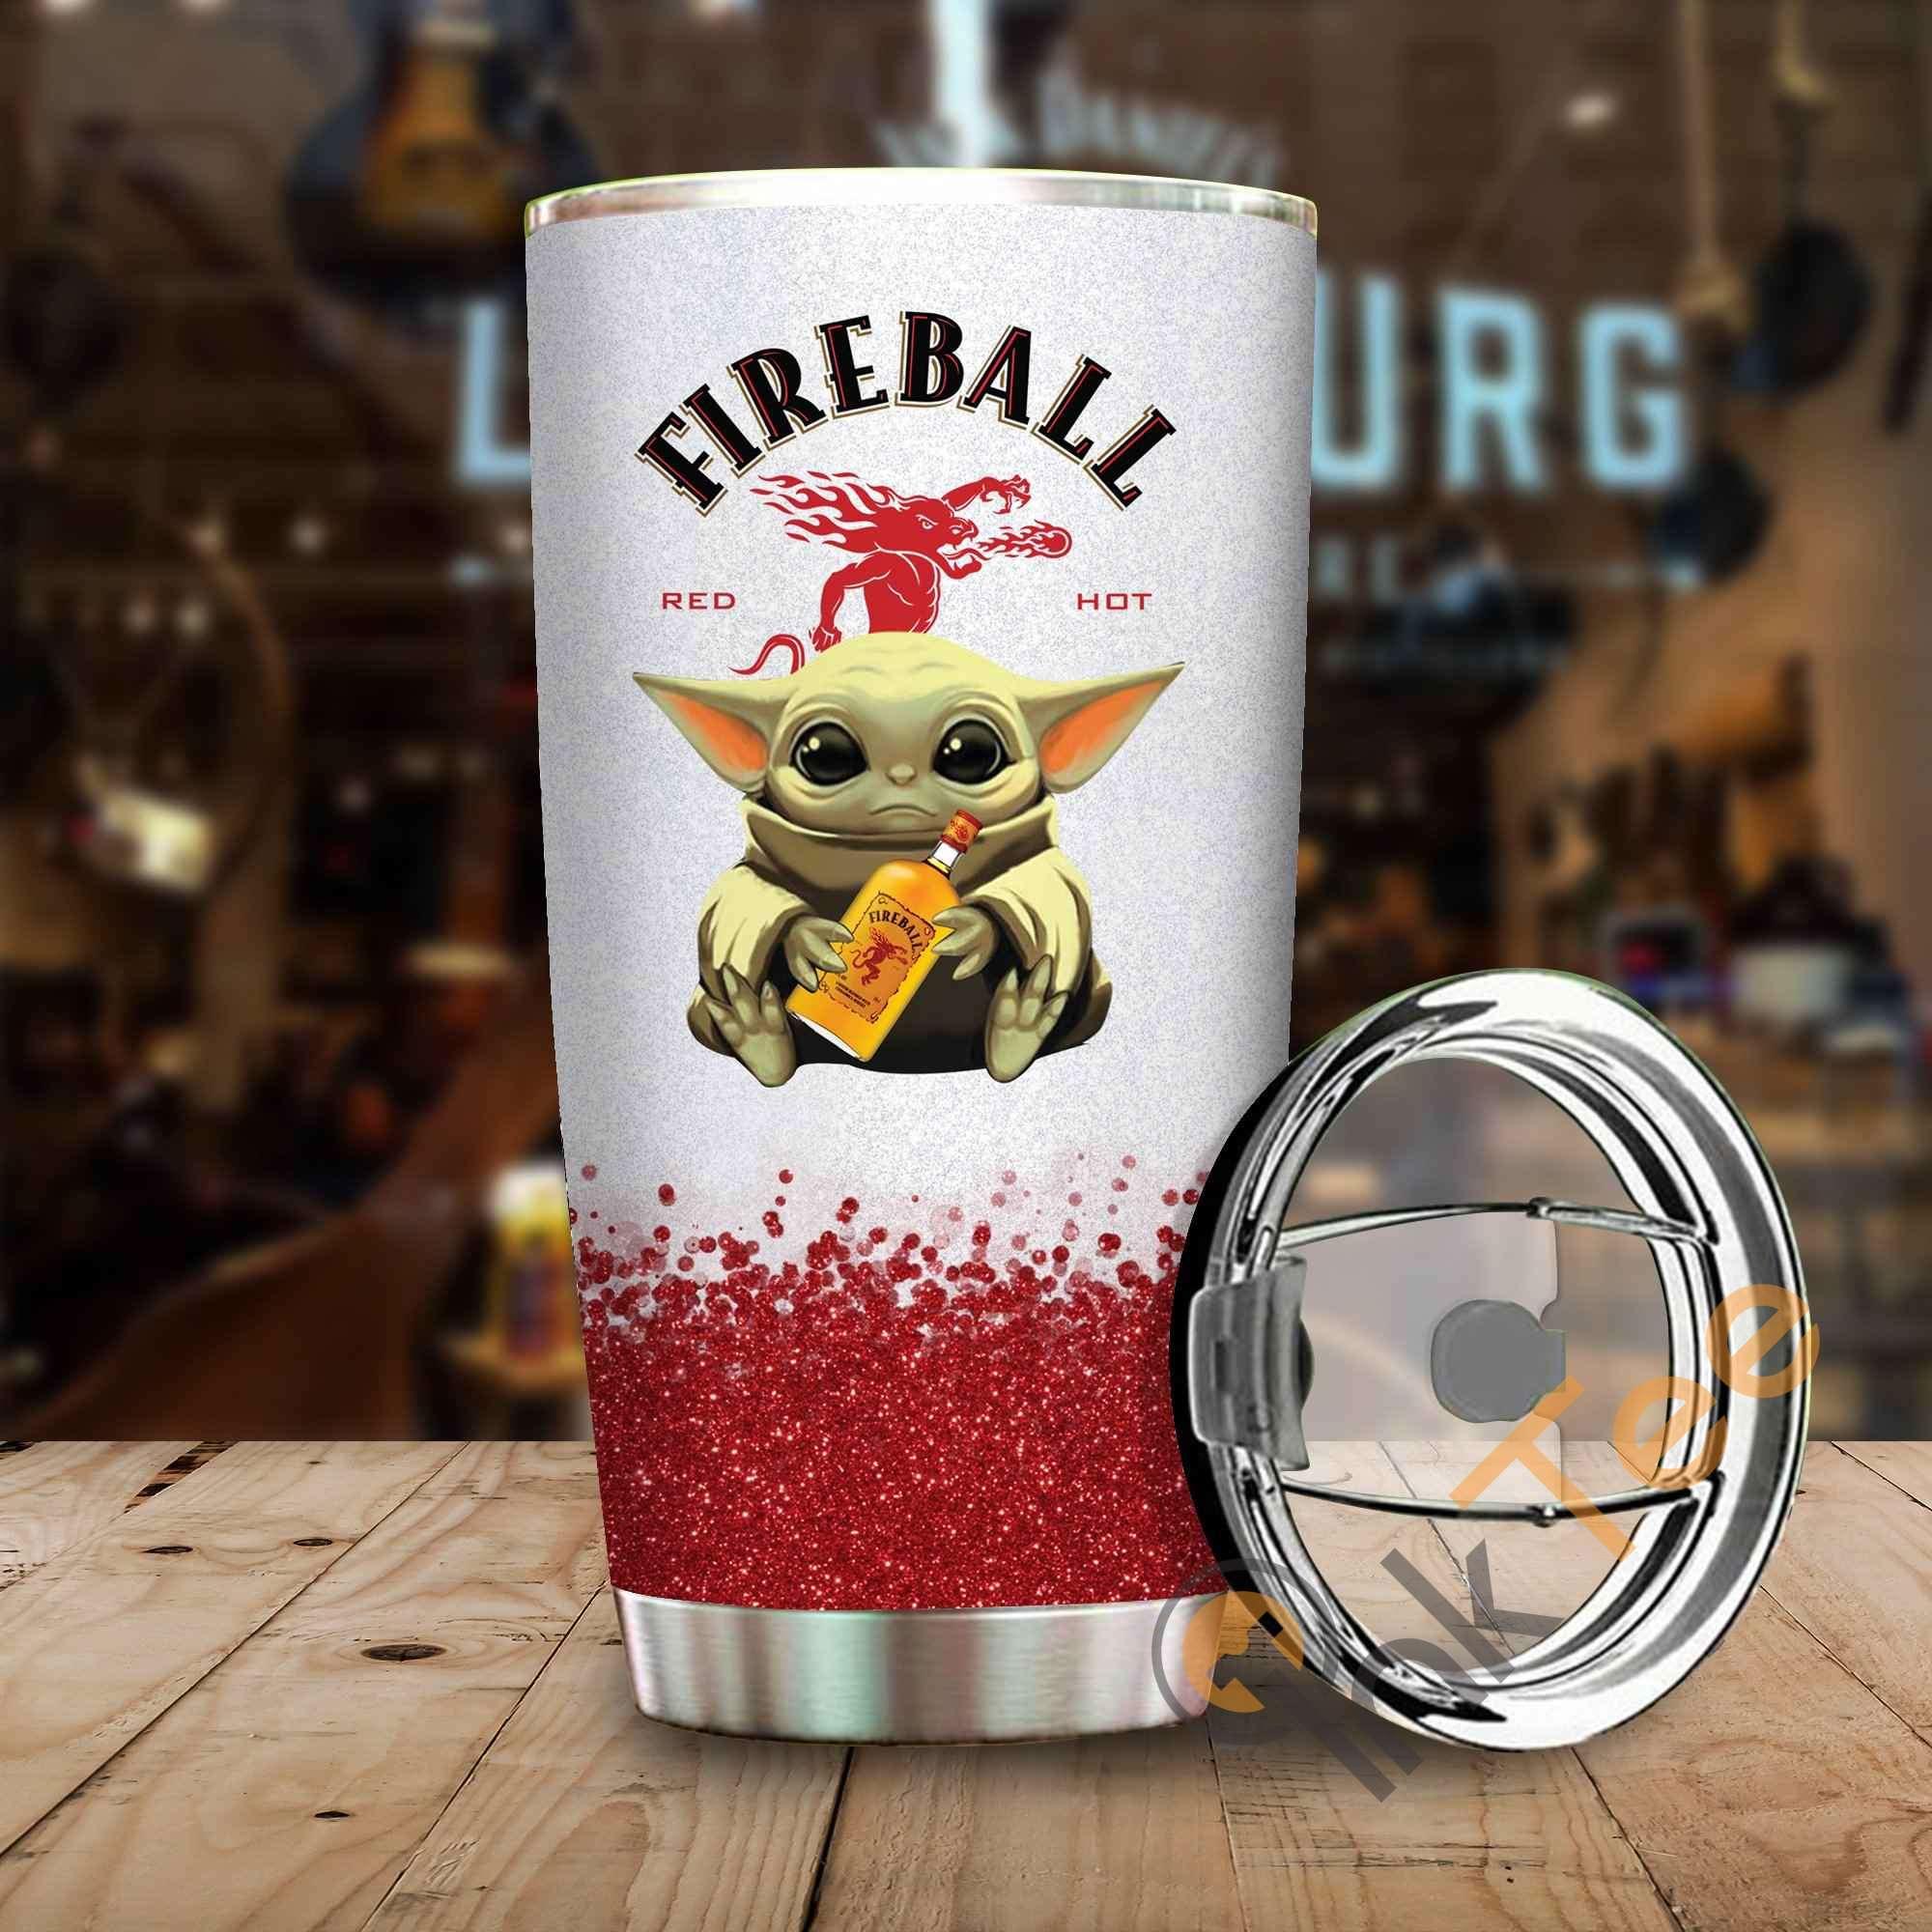 Baby Yoda Hold Fireball Wine Bottle Amazon Best Seller Sku 4085 Stainless Steel Tumbler